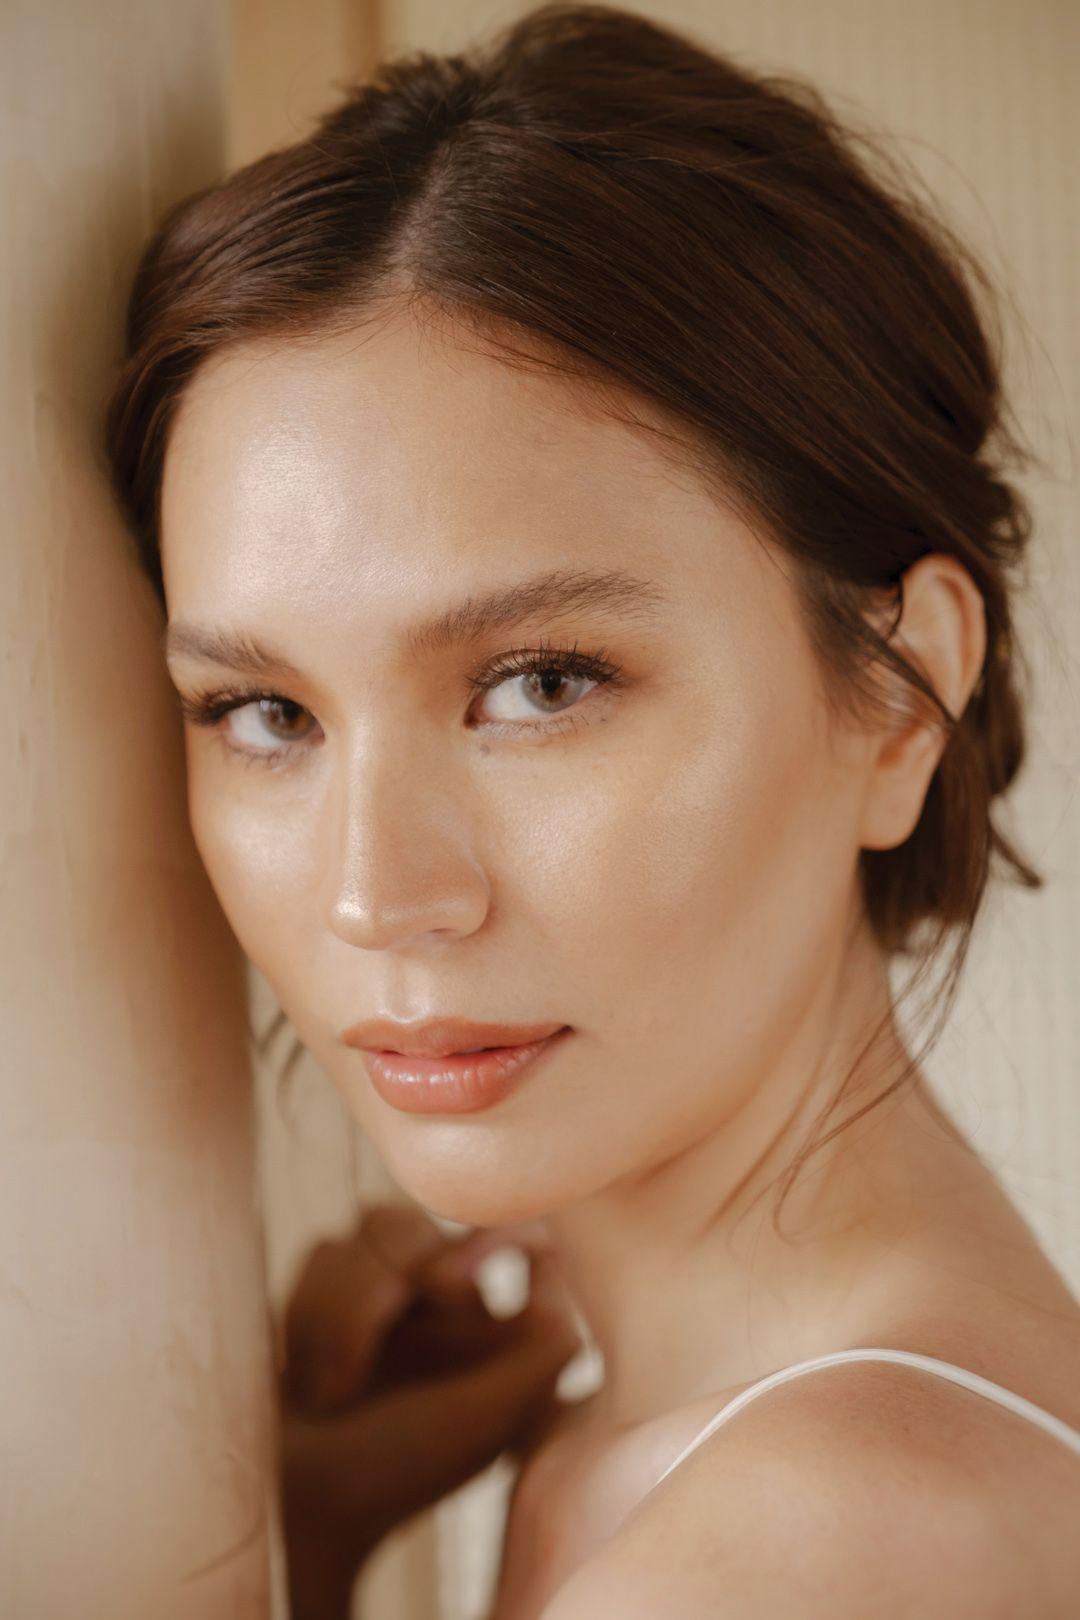 Skincare Secrets: Jess Wilson Shares Her Evening Skincare Routine